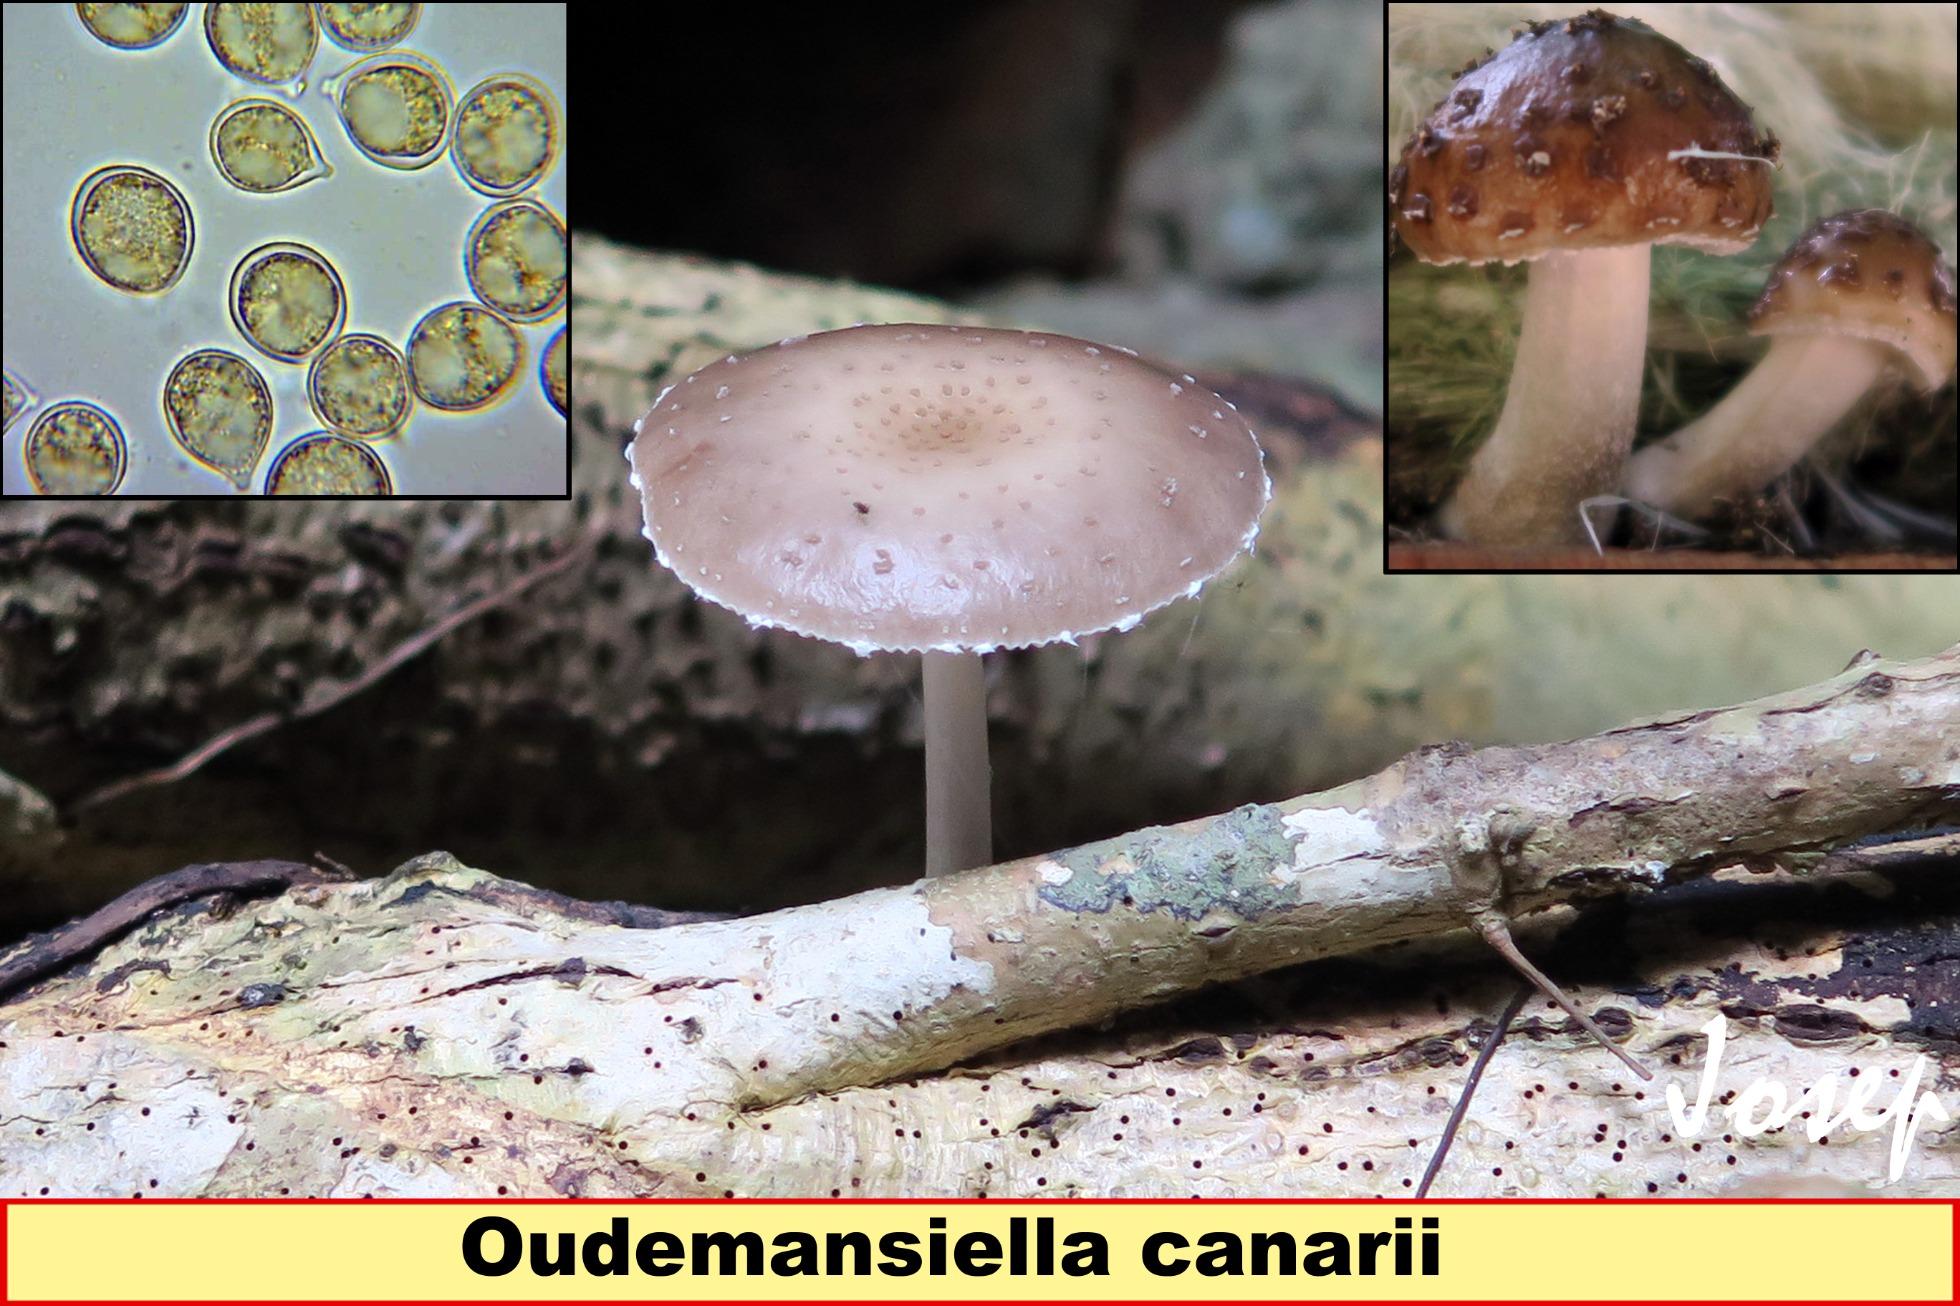 Oudemansiellacanarii_2021-09-01.jpg